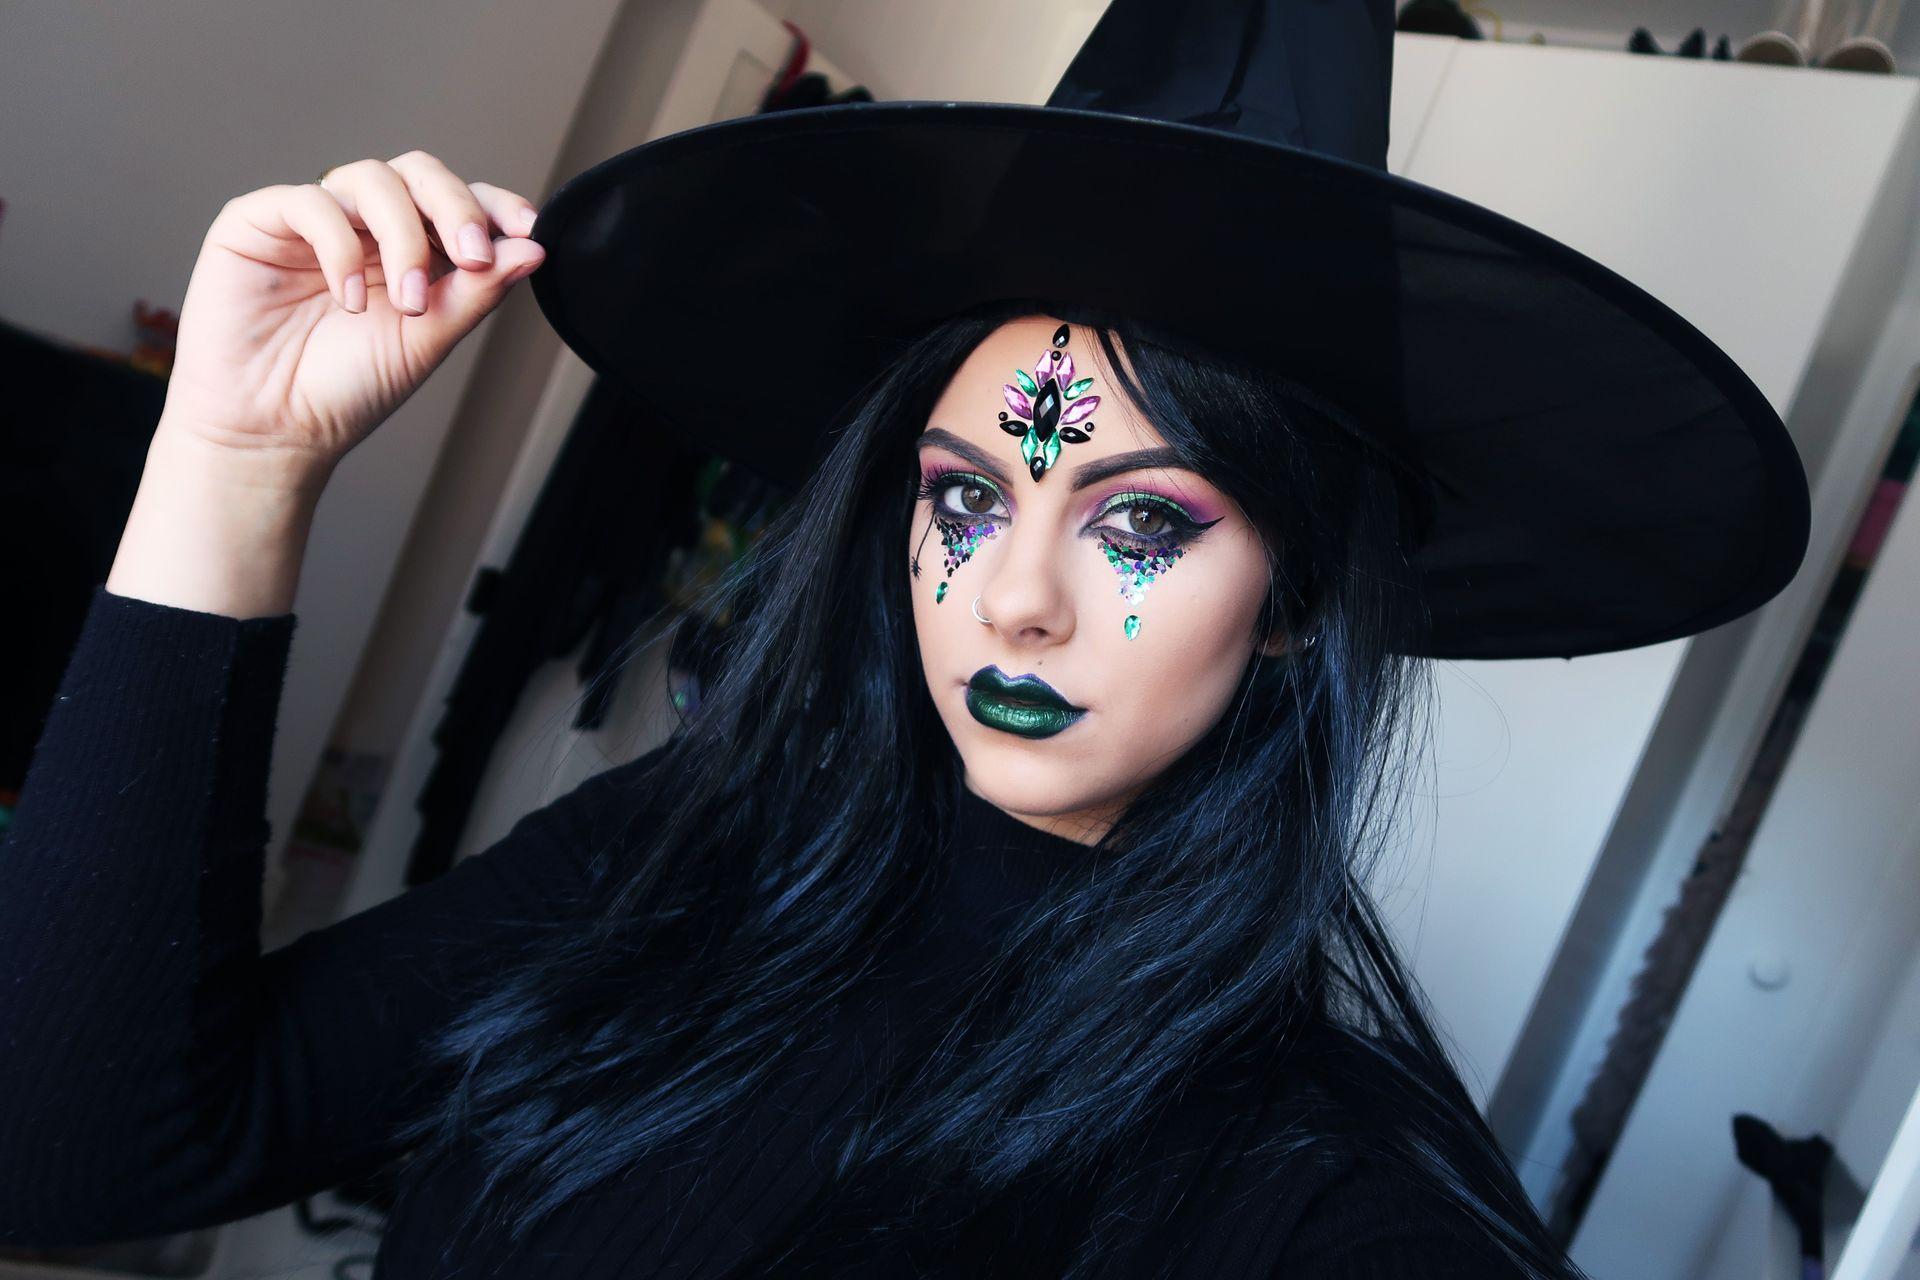 хэллоуин ведьма макияж фото все